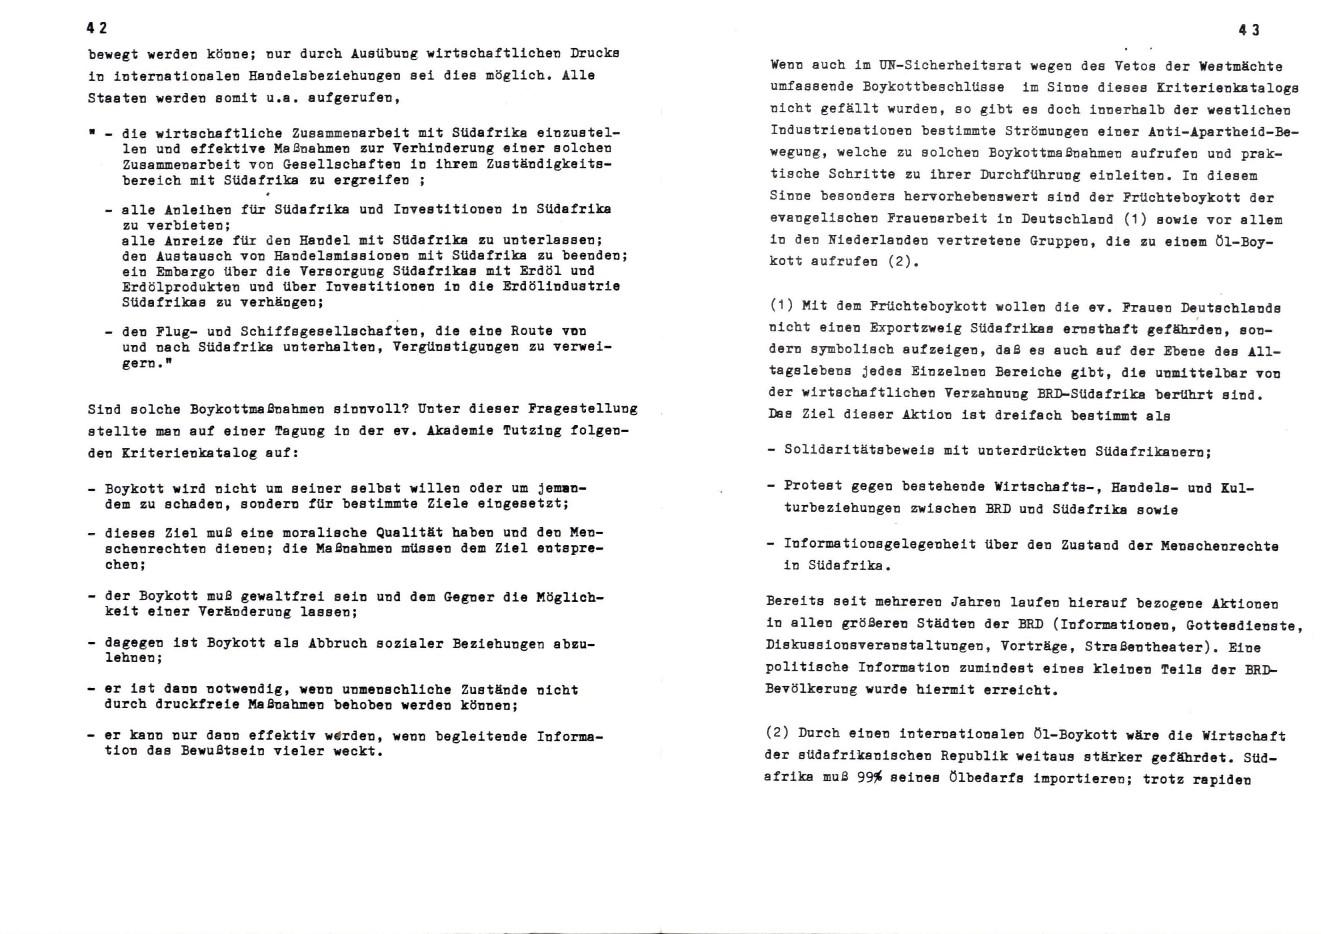 Muenster_AKAFRIK_1981_Suedafrika_BRD_23